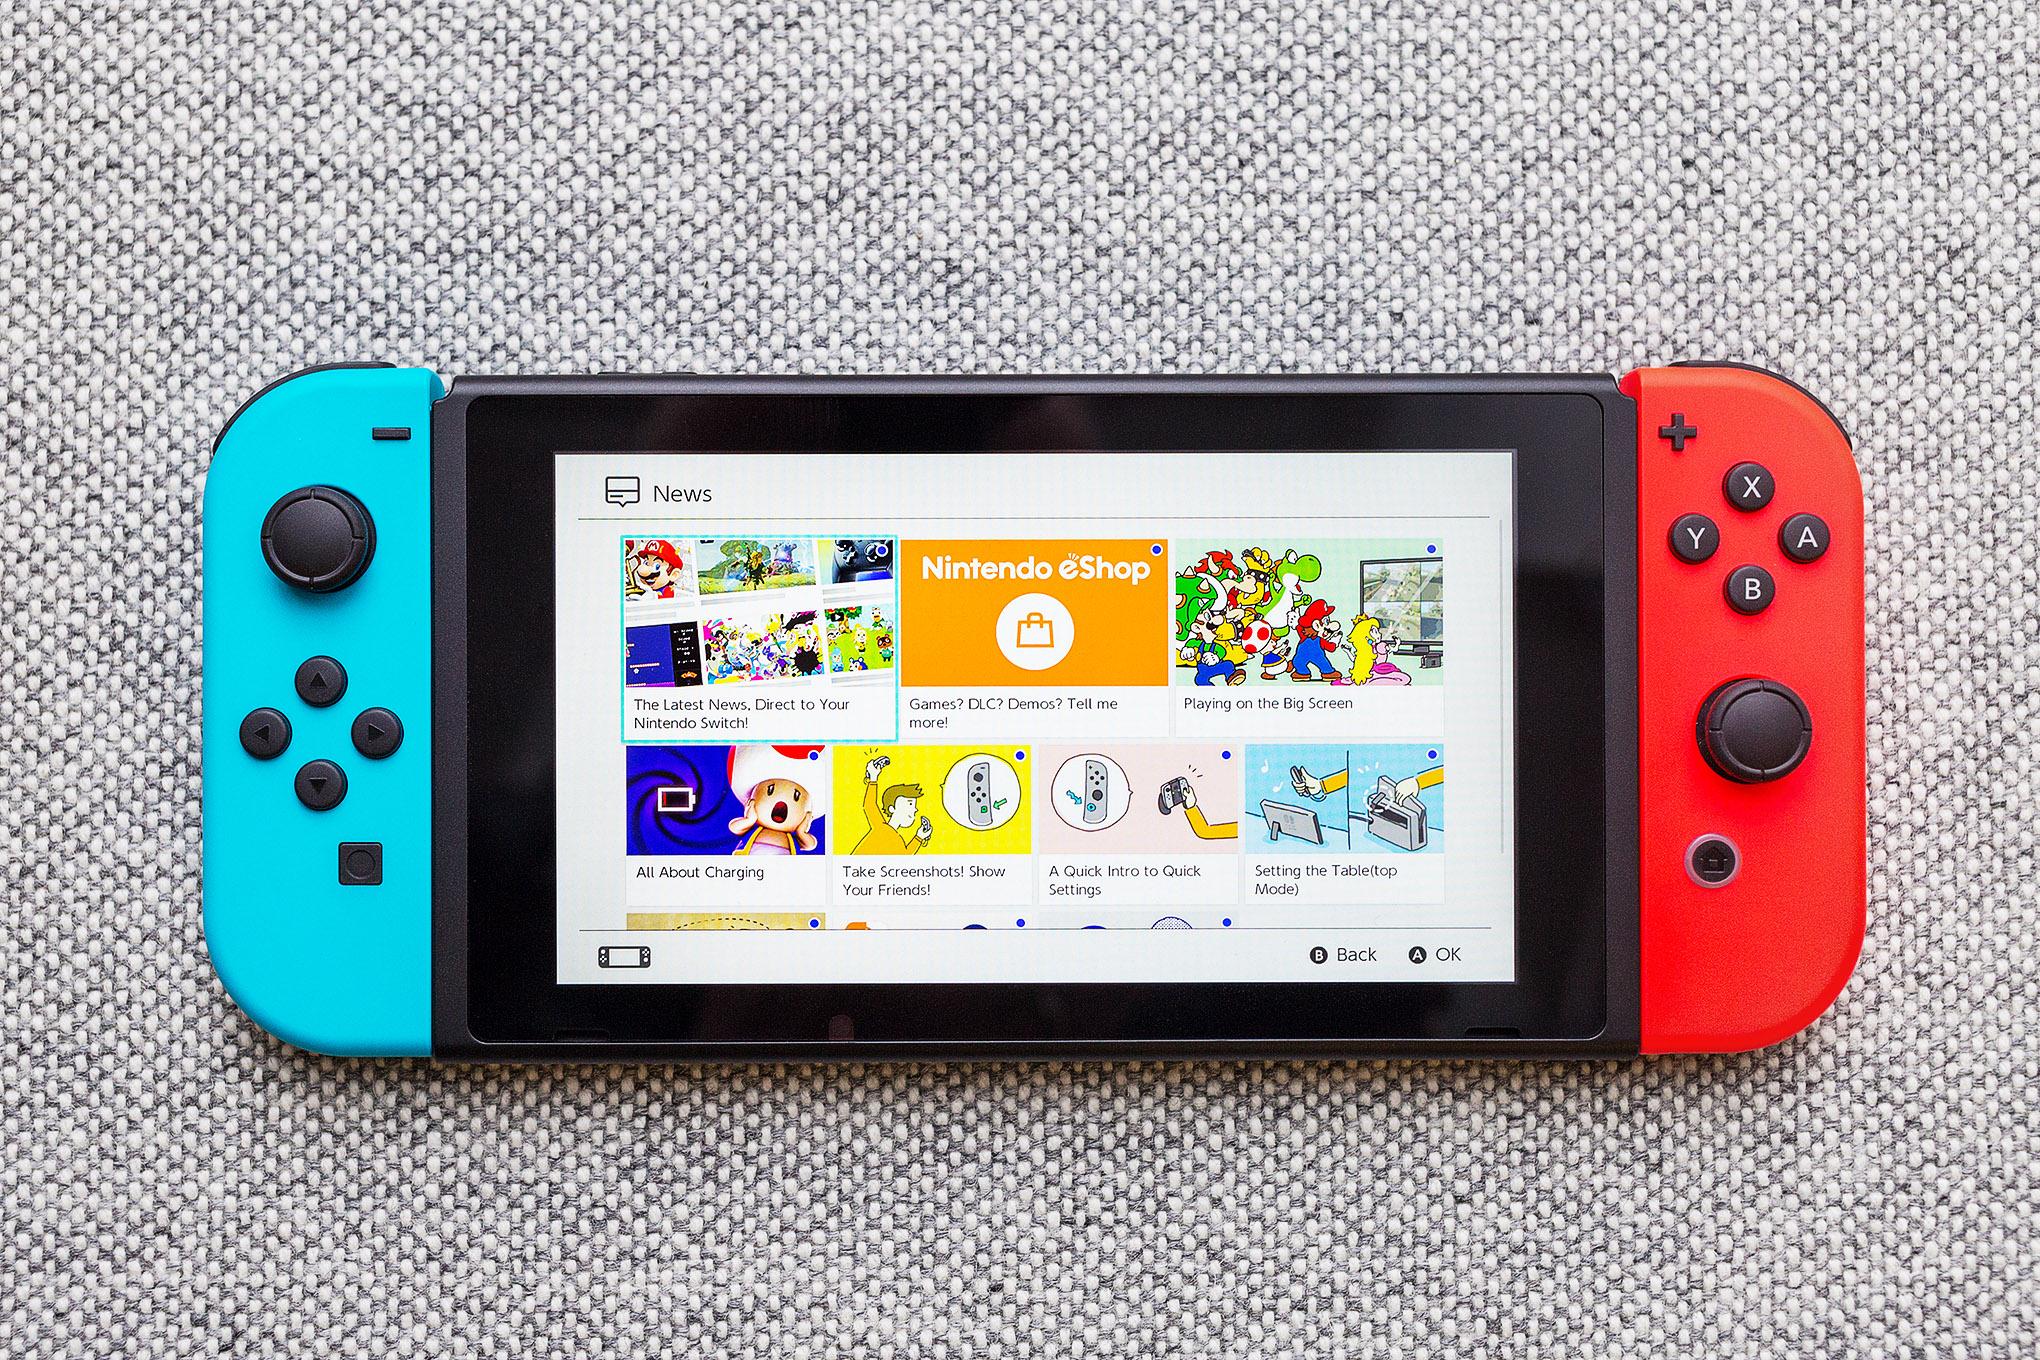 EB Games confirms it won't price match Big W's Switch + game bundles